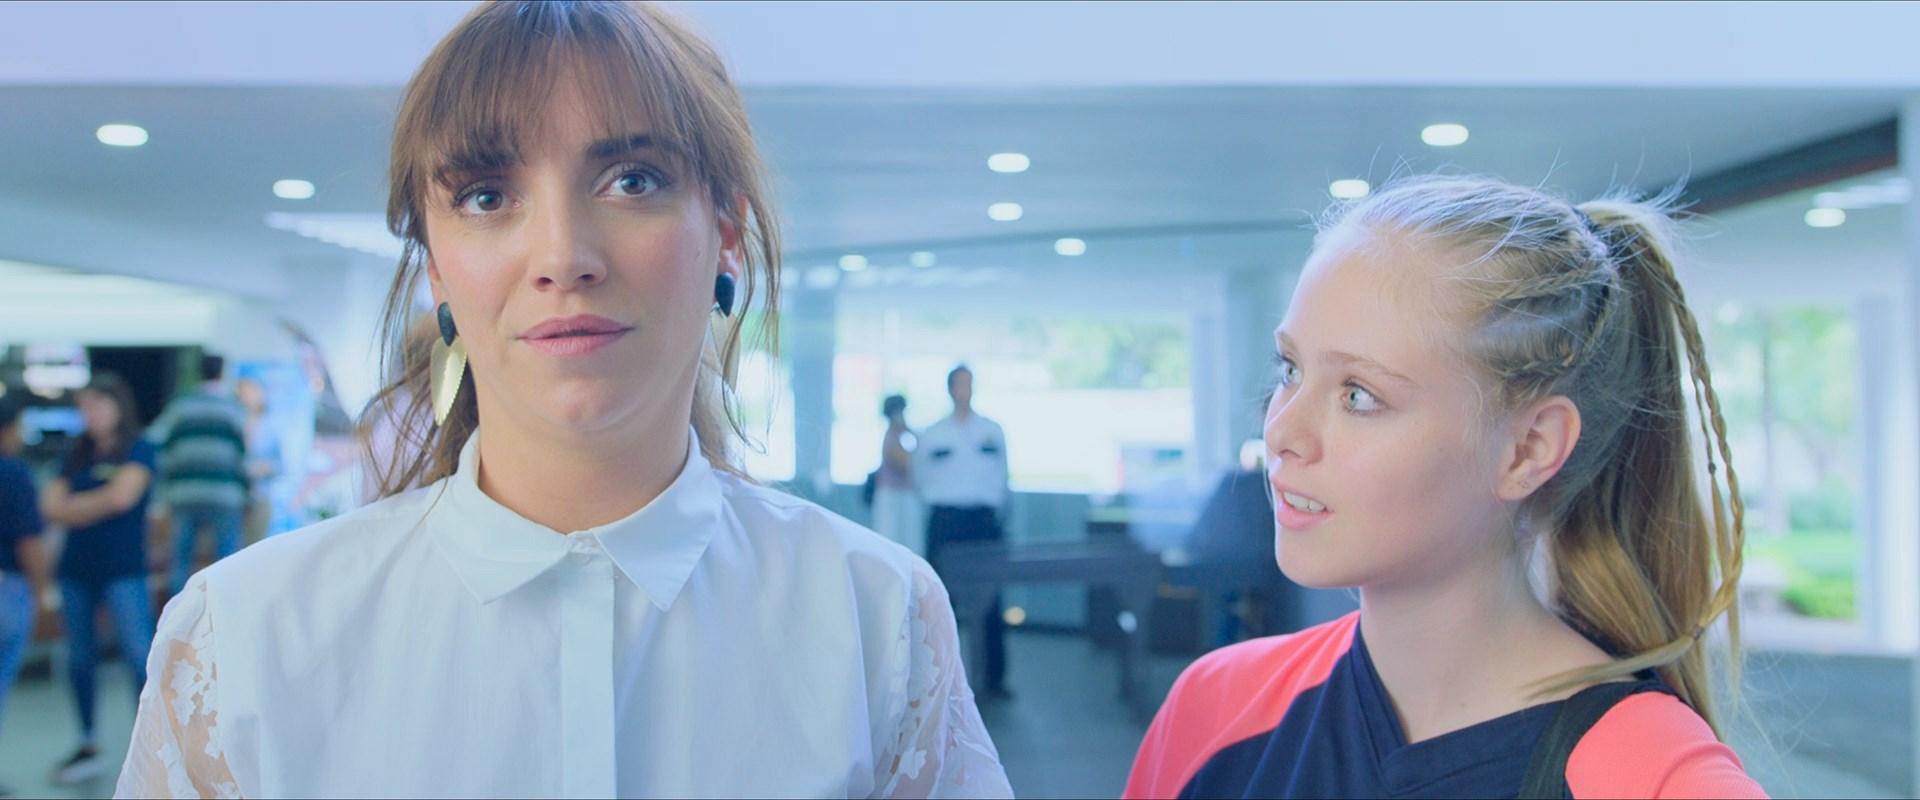 Guerra de likes (2021) 1080p WEB-DL AMZN Latino